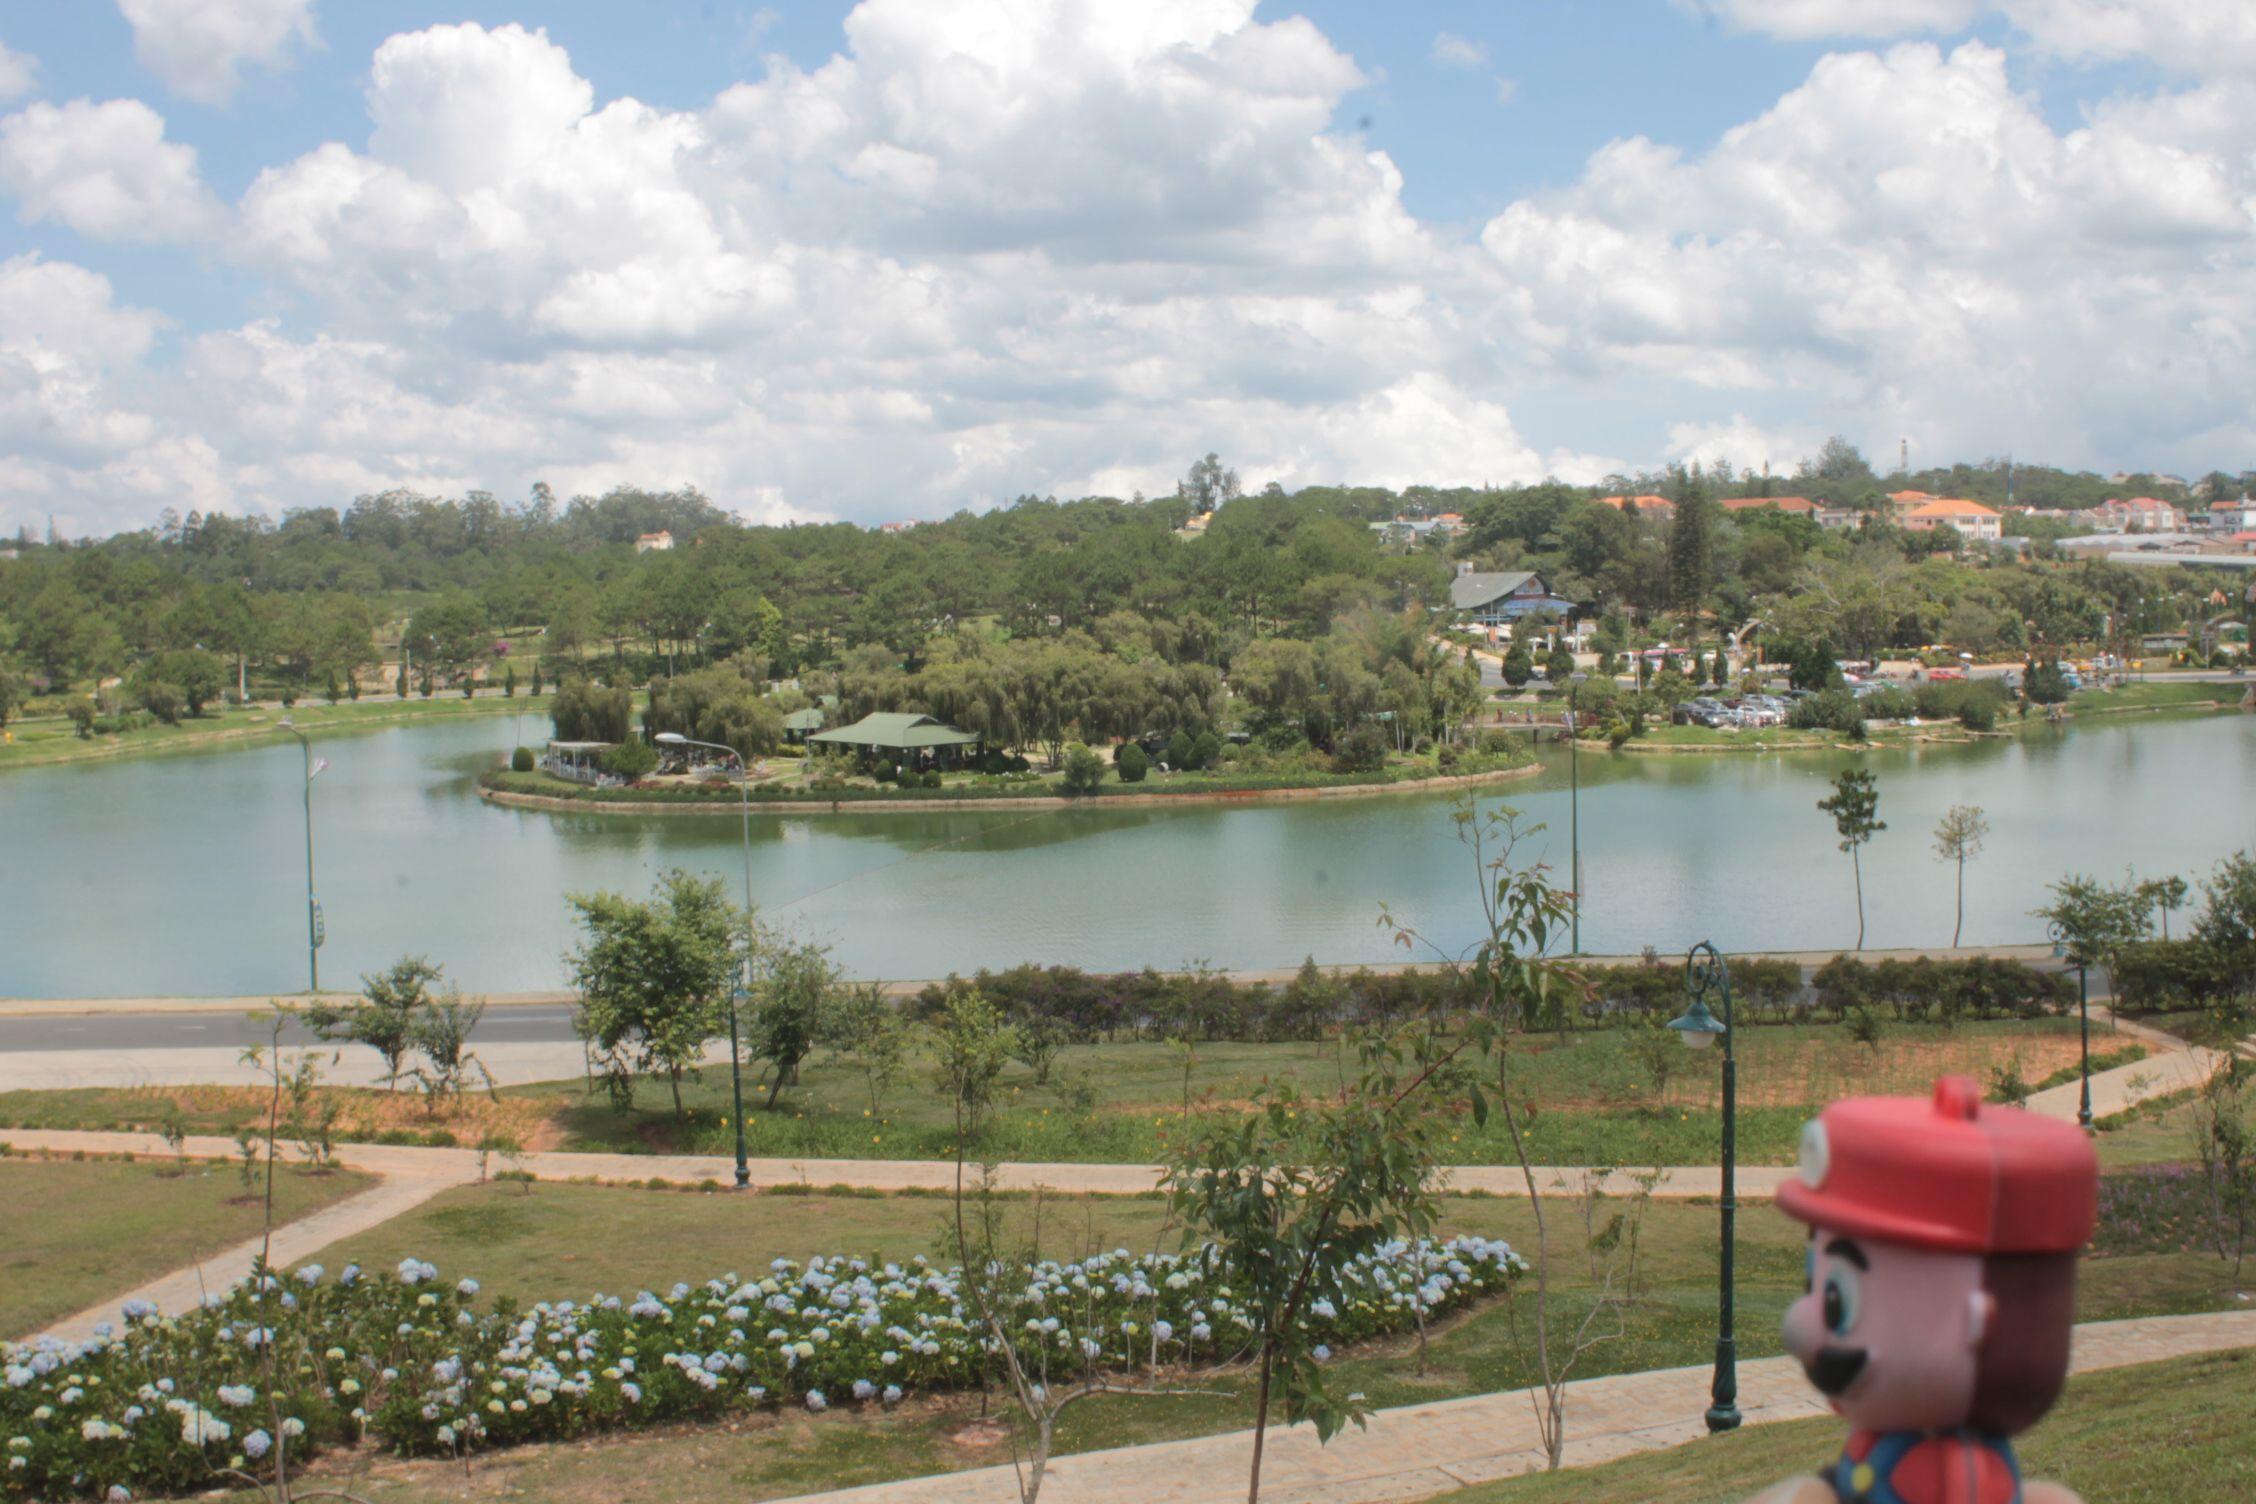 En el lago de Dalat